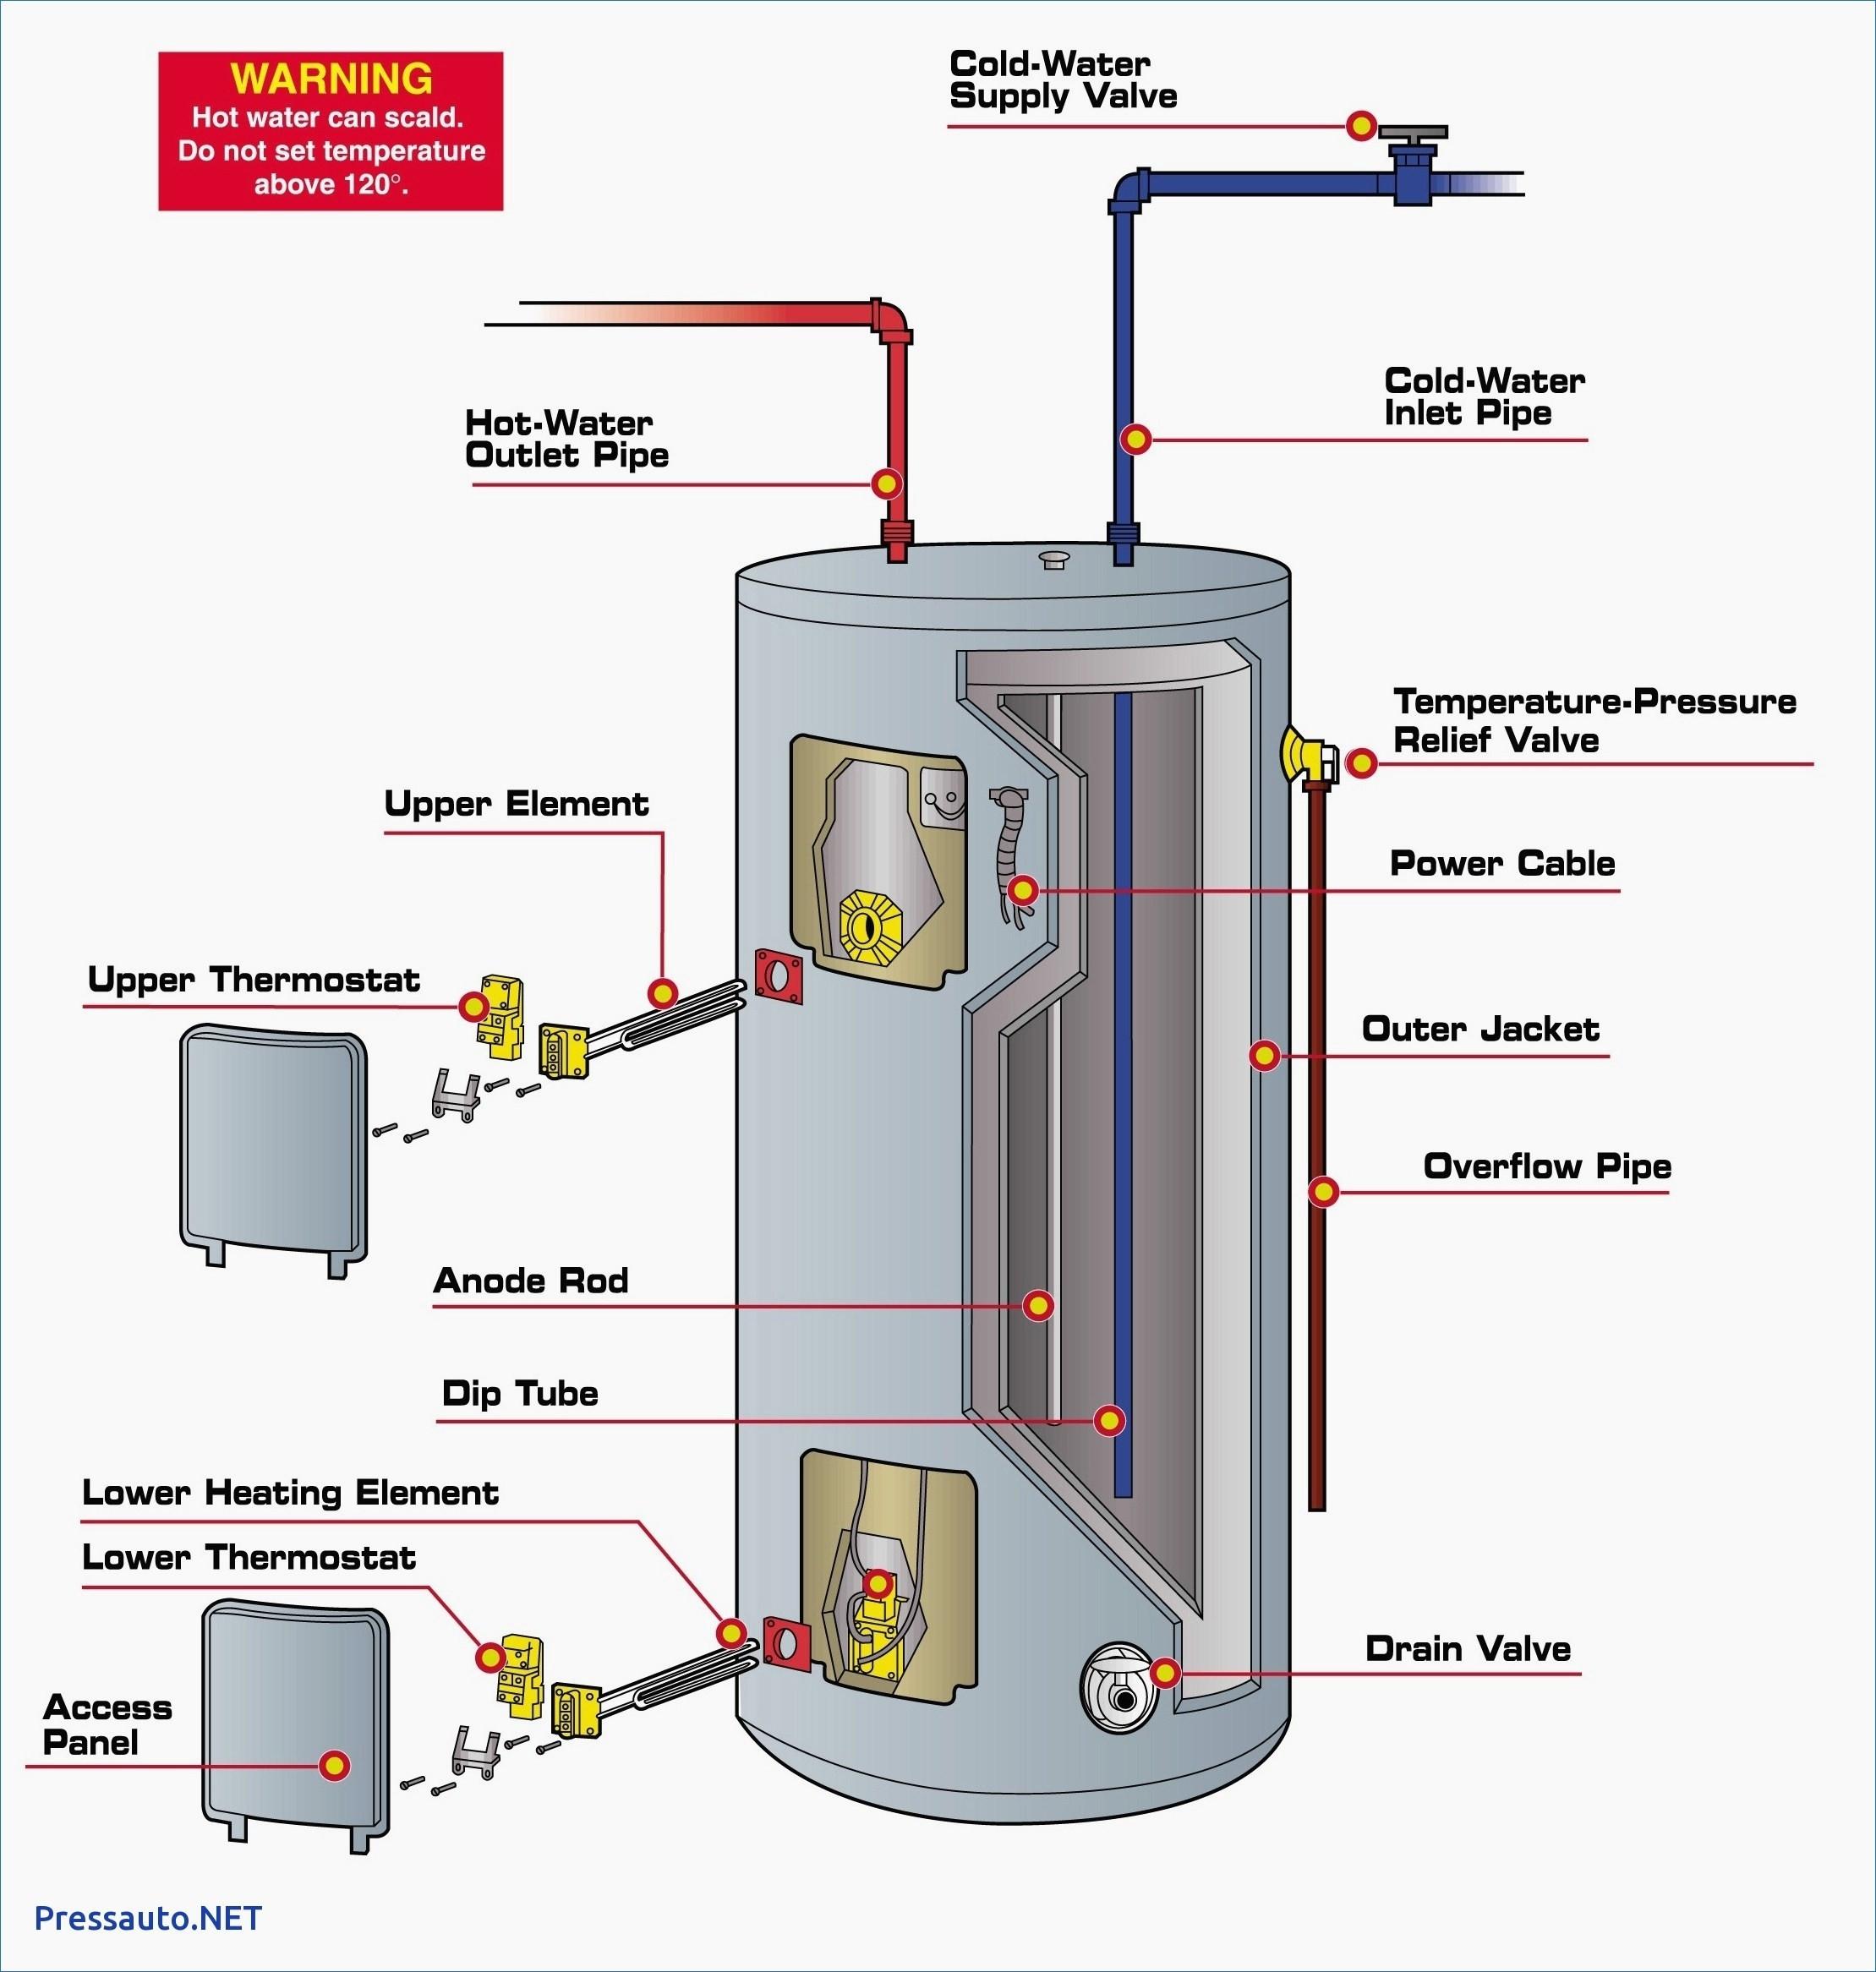 220v water heater wiring diagram wiring diagram g8 electric heater wiring  diagram 110 water heater wiring diagram